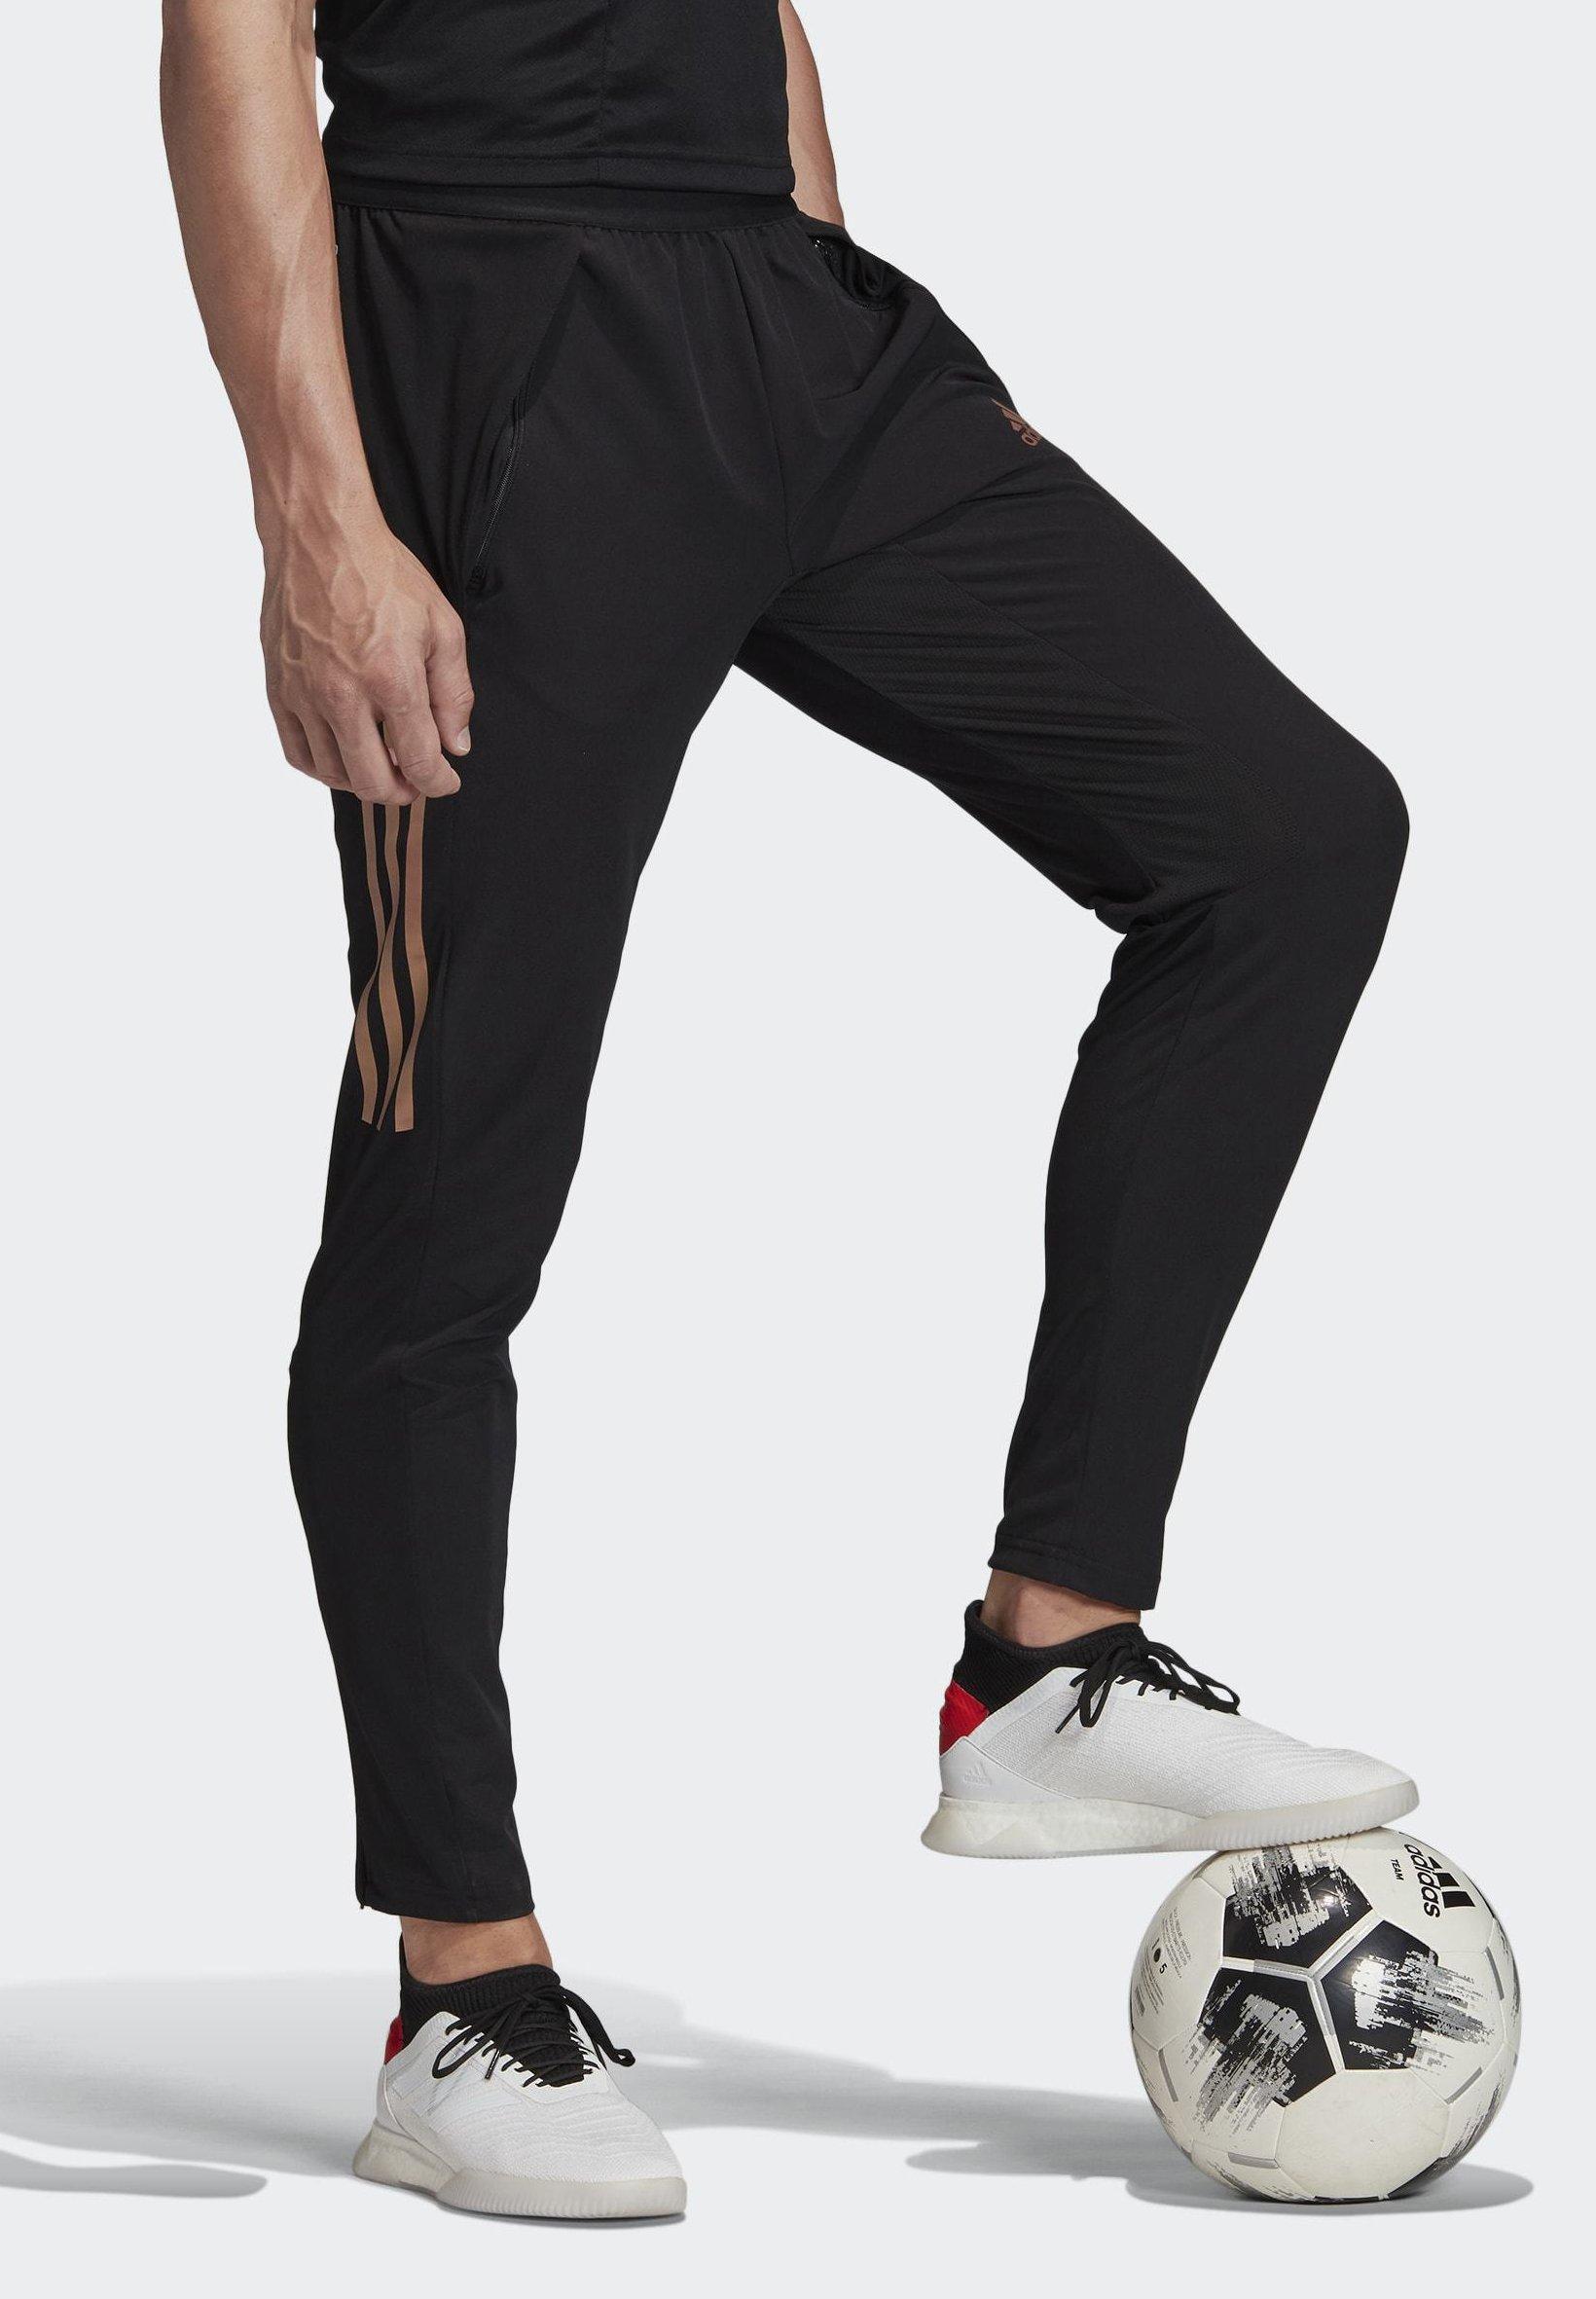 adidas Performance CONDIVO 20 ULTIMATE TRAINING TRACKSUIT BOTTOMS - Pantalon de survêtement - black